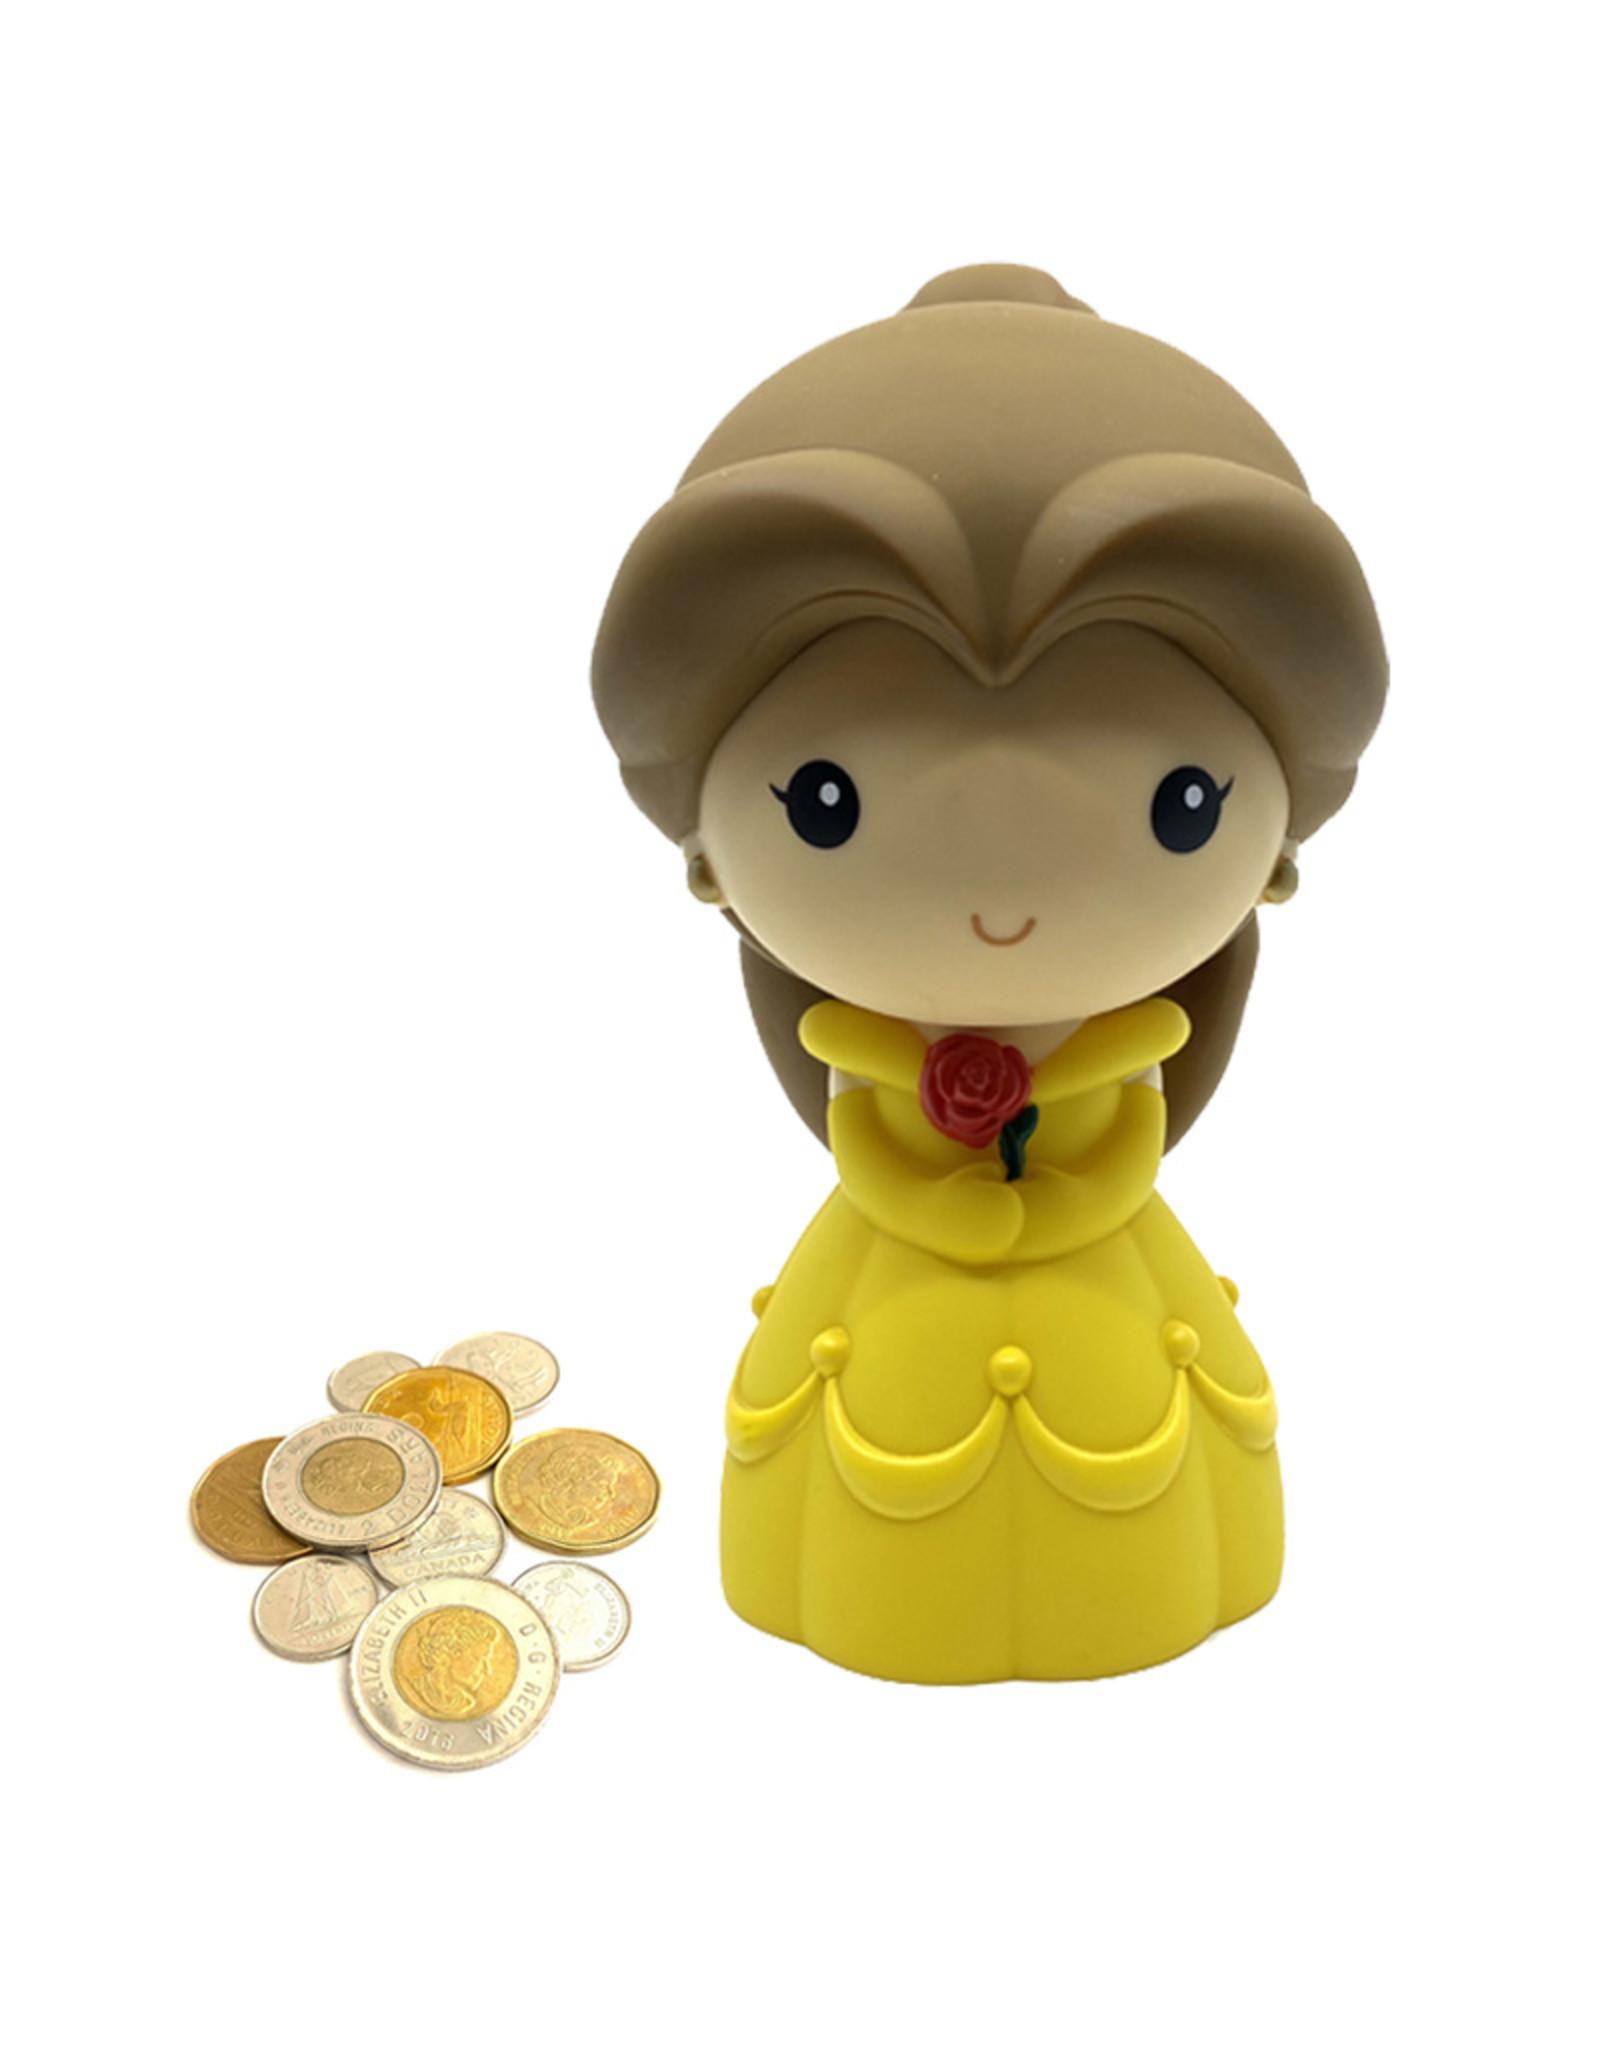 Disney Disney ( Bank ) Belle with Flower